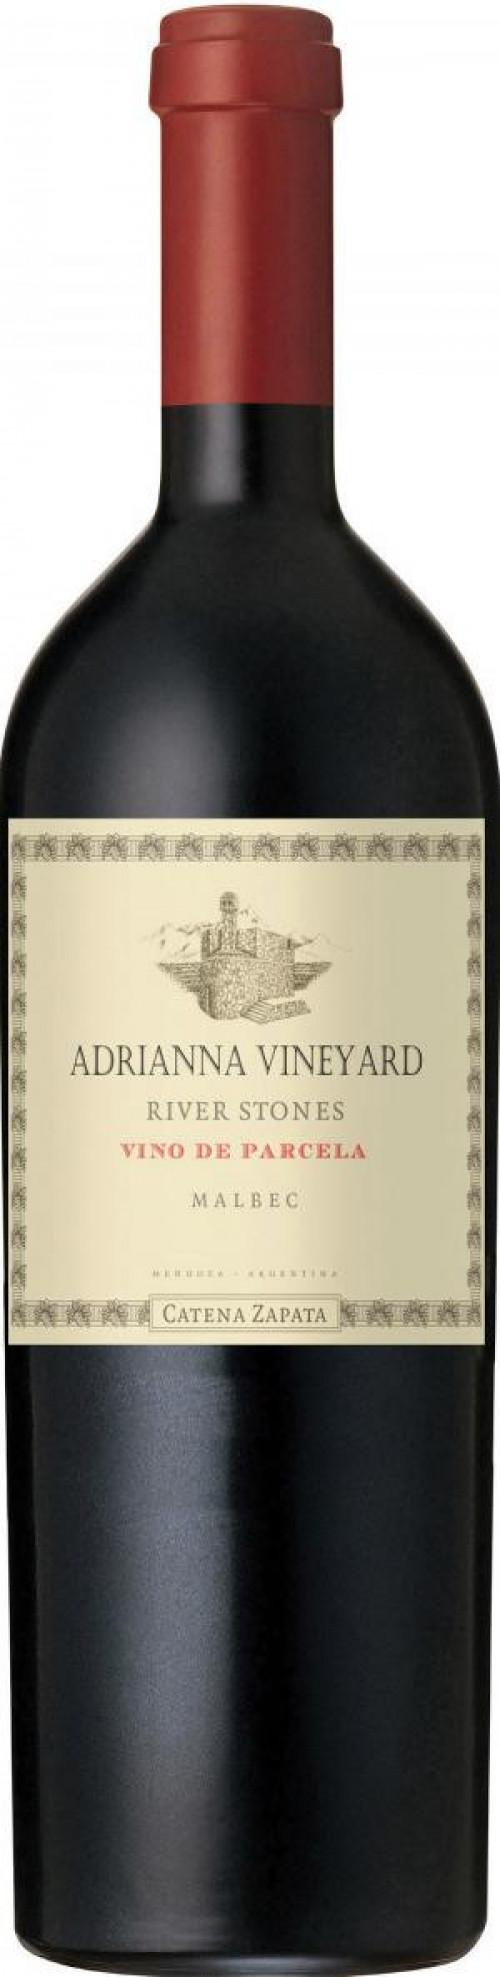 2017 Catena Zapata Malbec Adrianna Vineyard River Stones 750ml